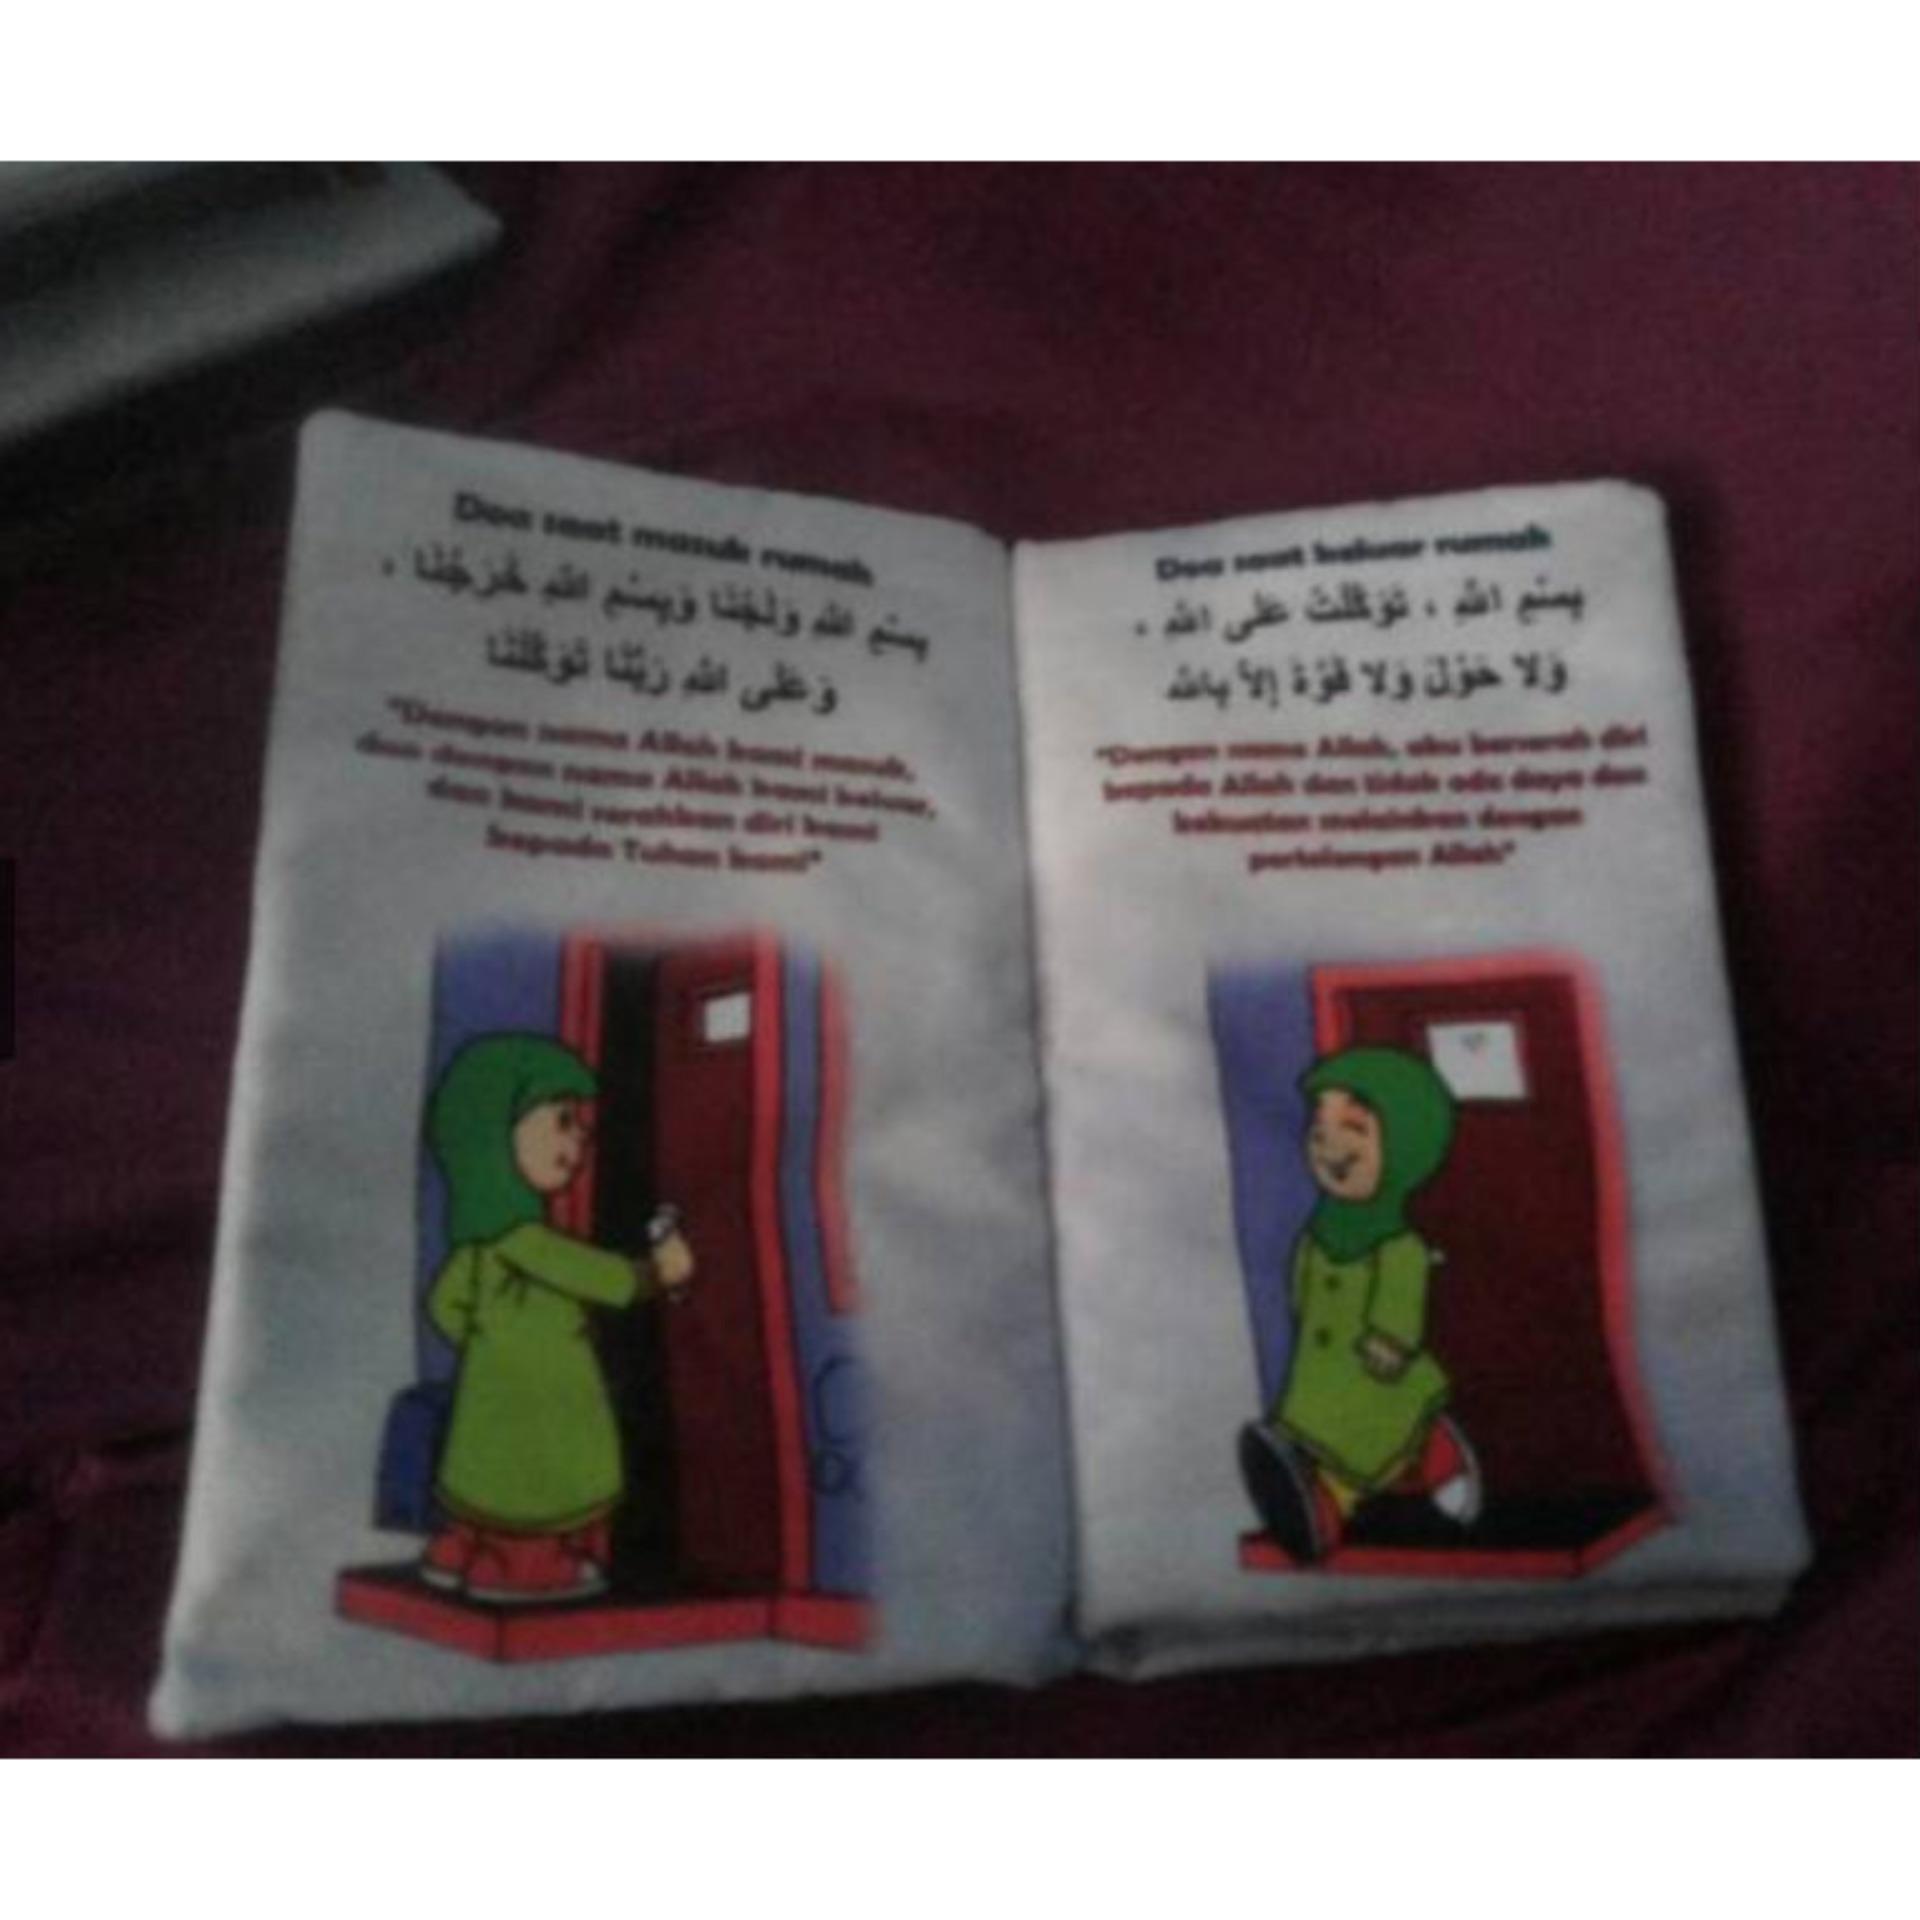 Fitur Doa Anak Muslim Buku Bantal Mainan Bayi Edukasi Edukatif Binatang Apakah Aku Detail Gambar Terbaru